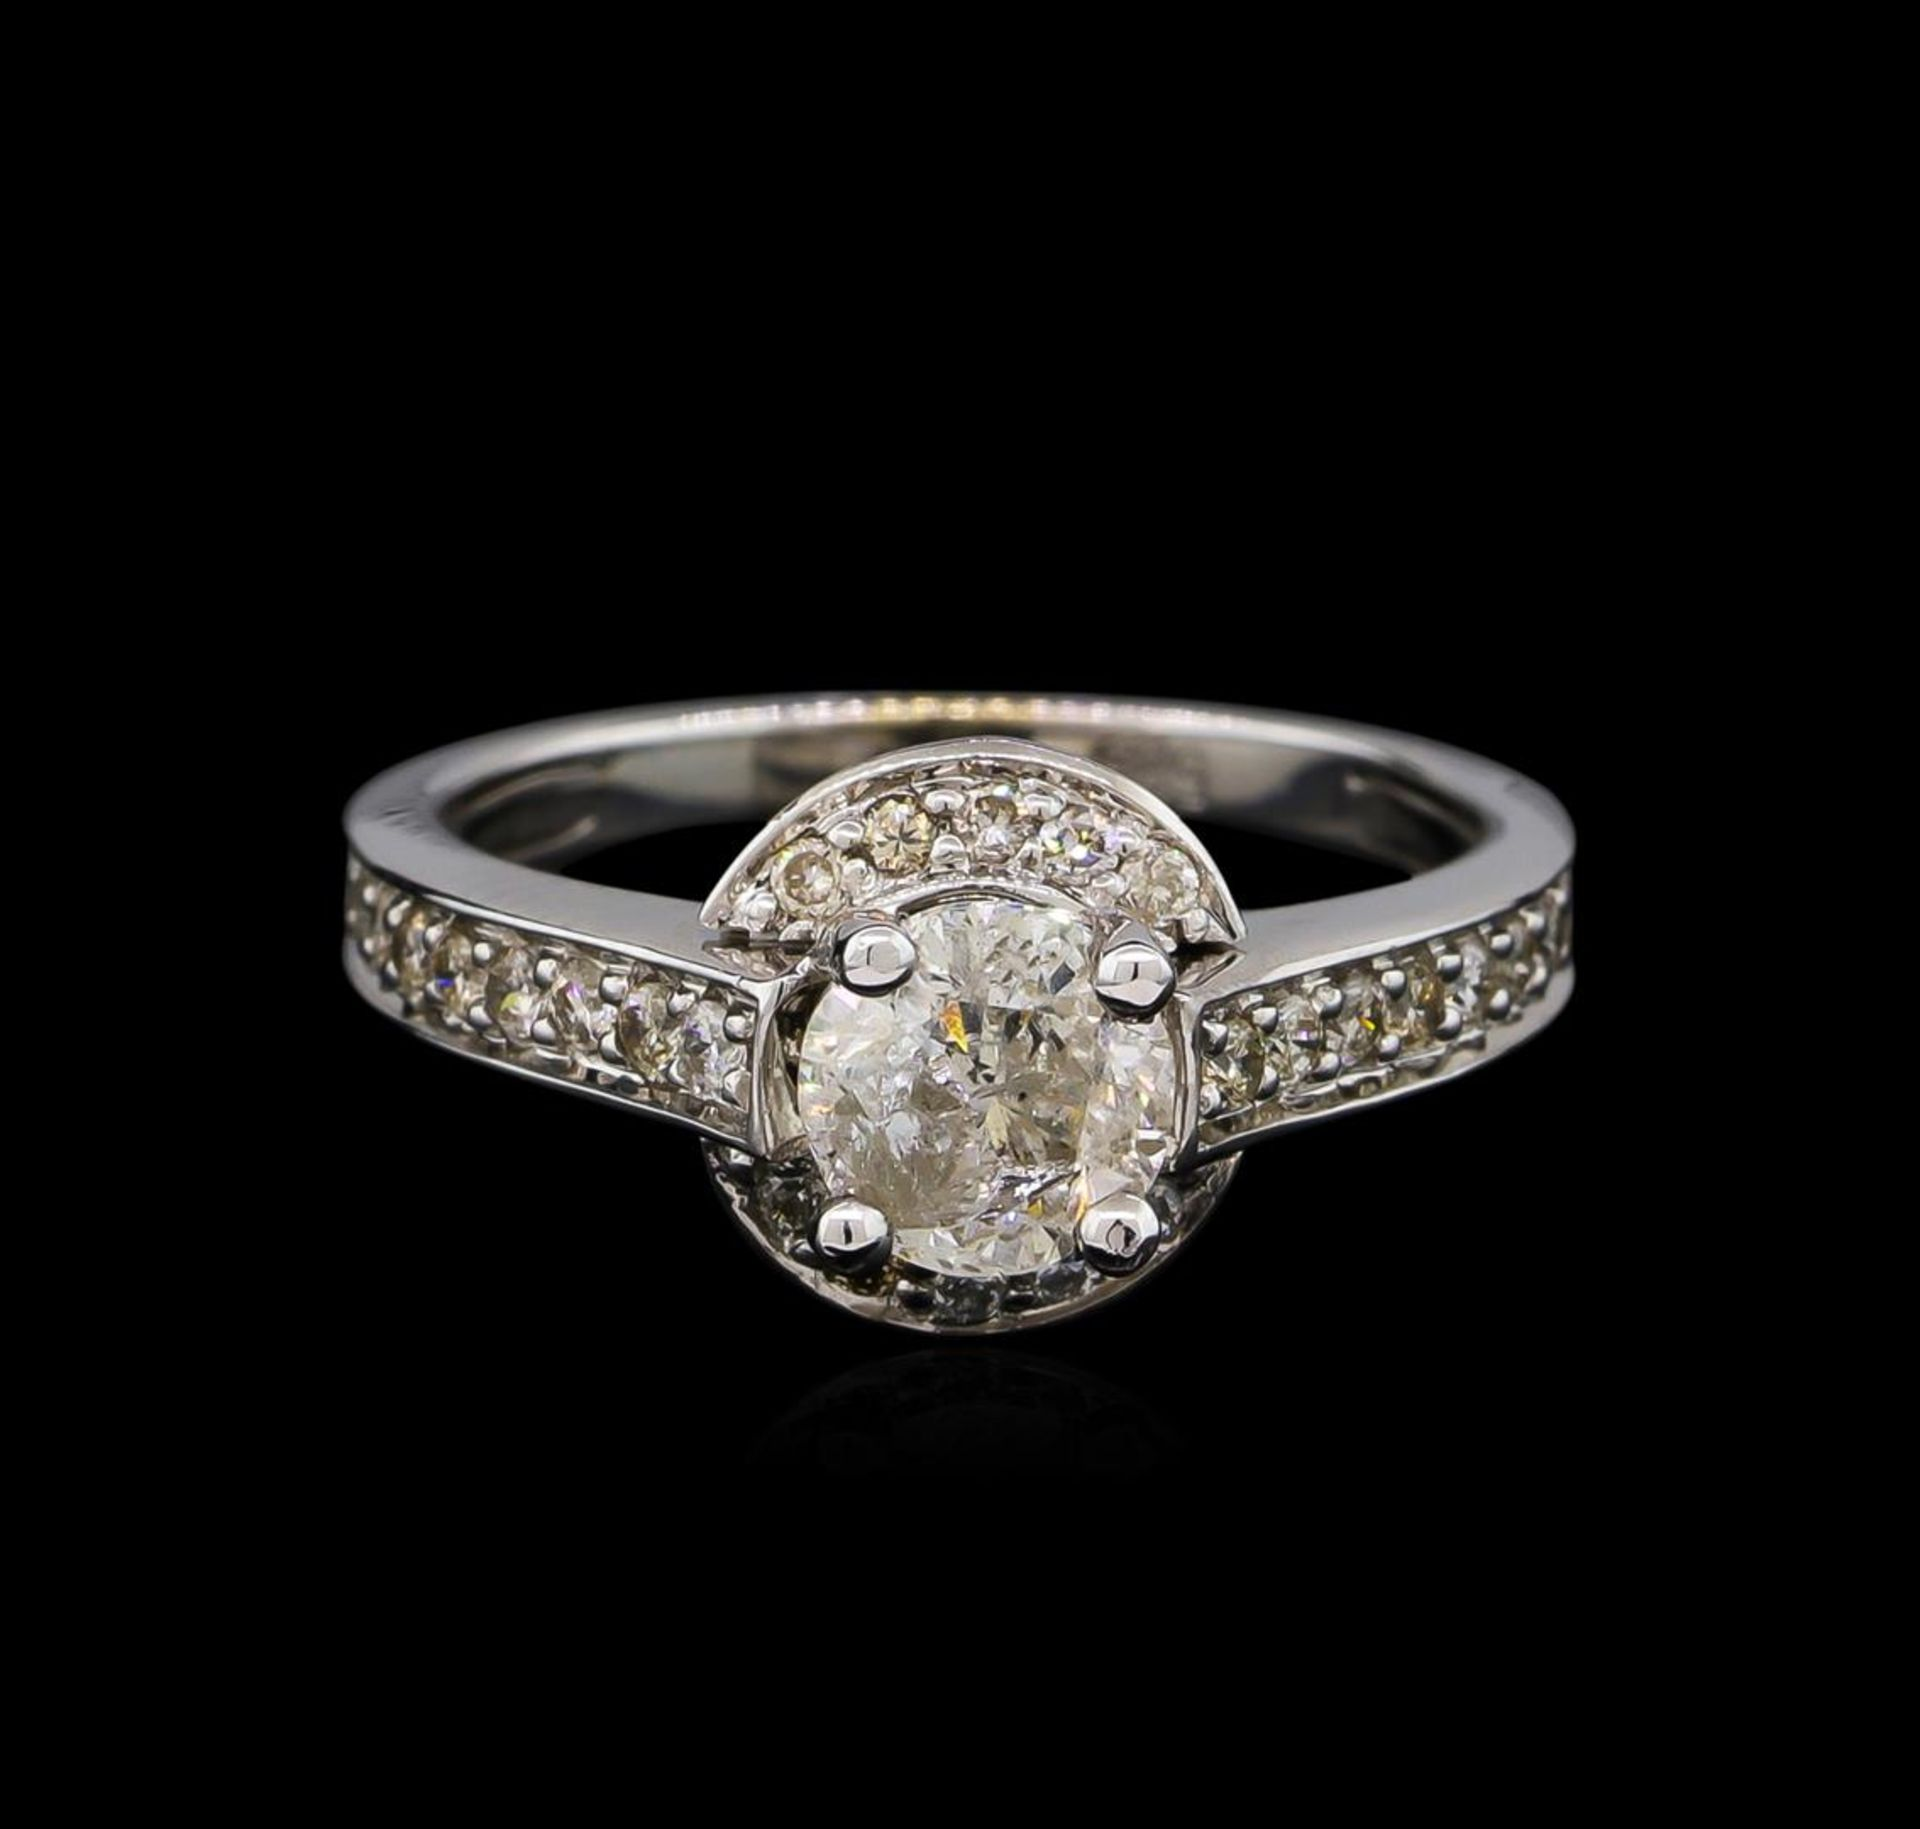 14KT White Gold 1.12 ctw Diamond Ring - Image 2 of 5